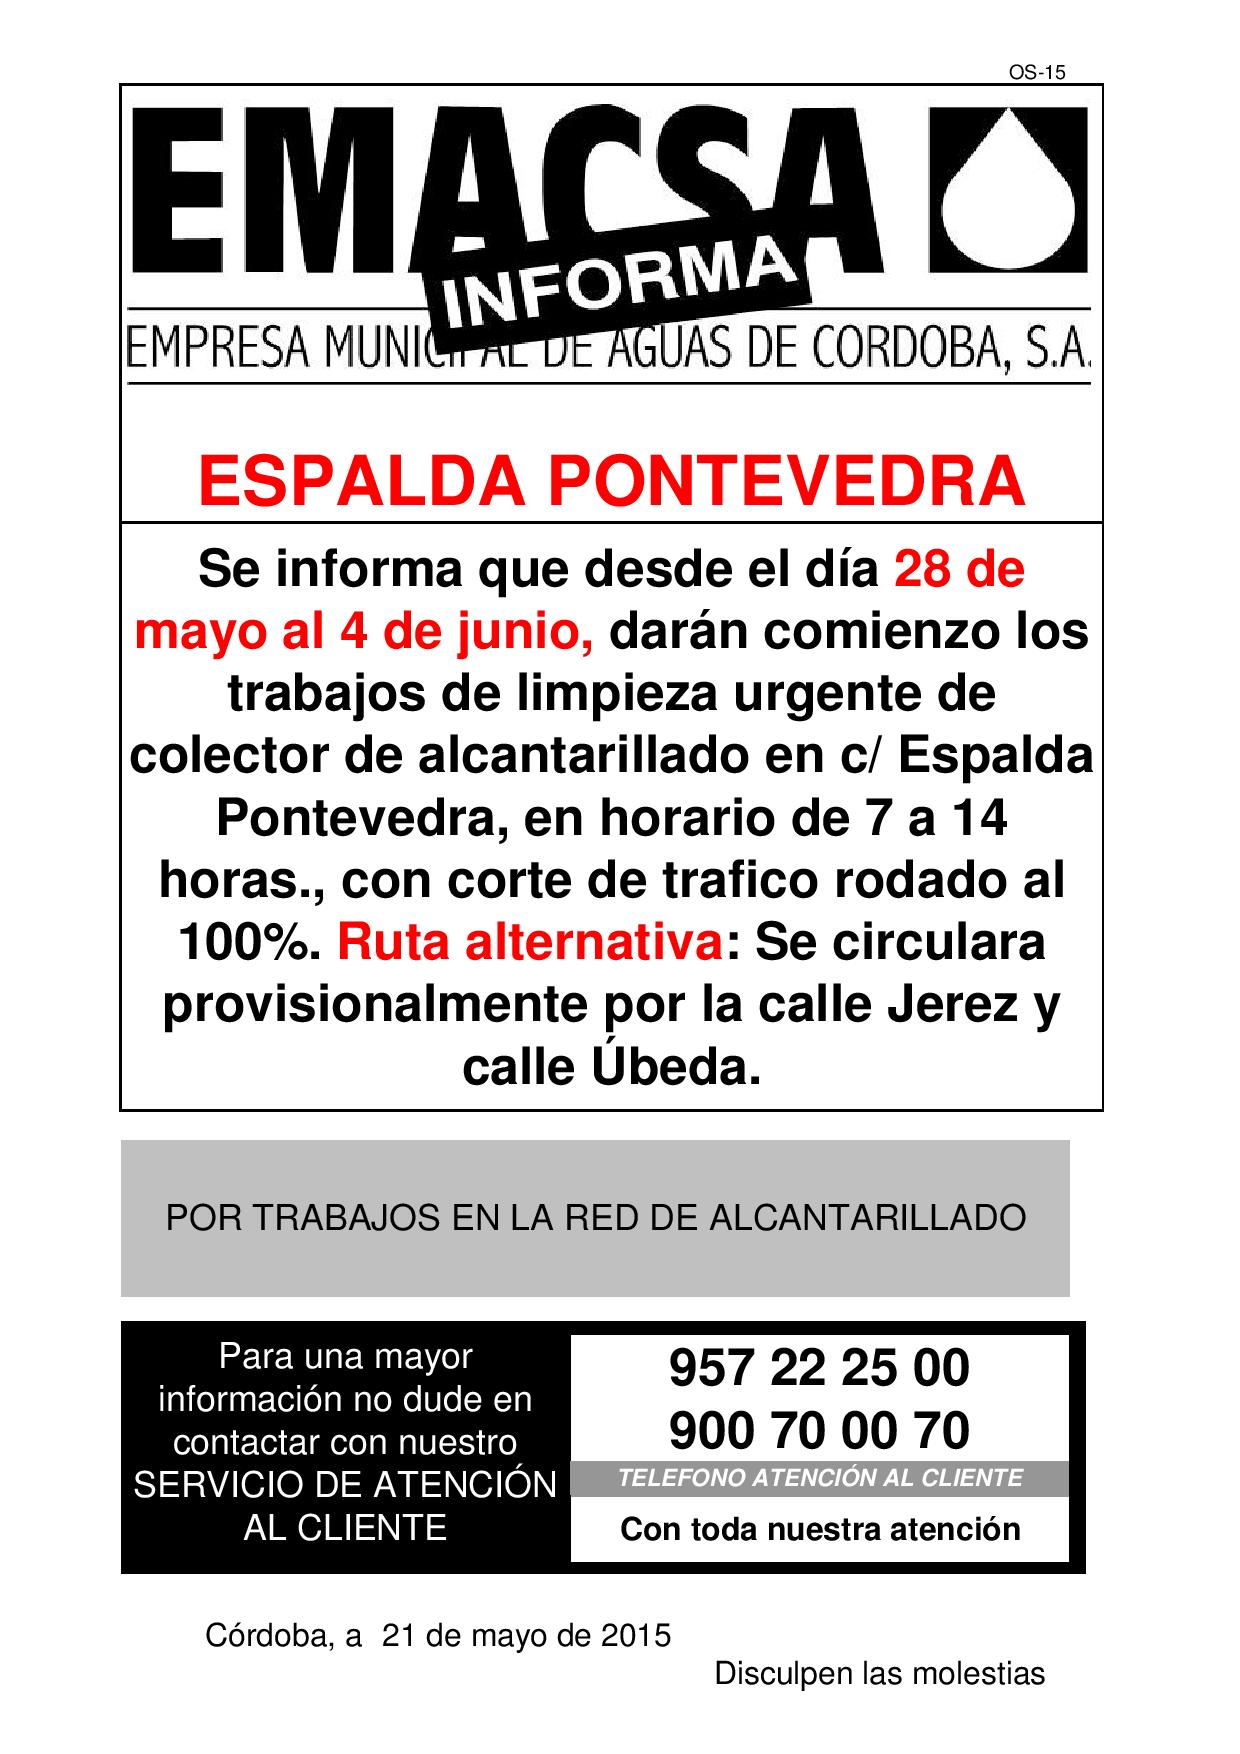 ESPALDA PONTEVEDRA